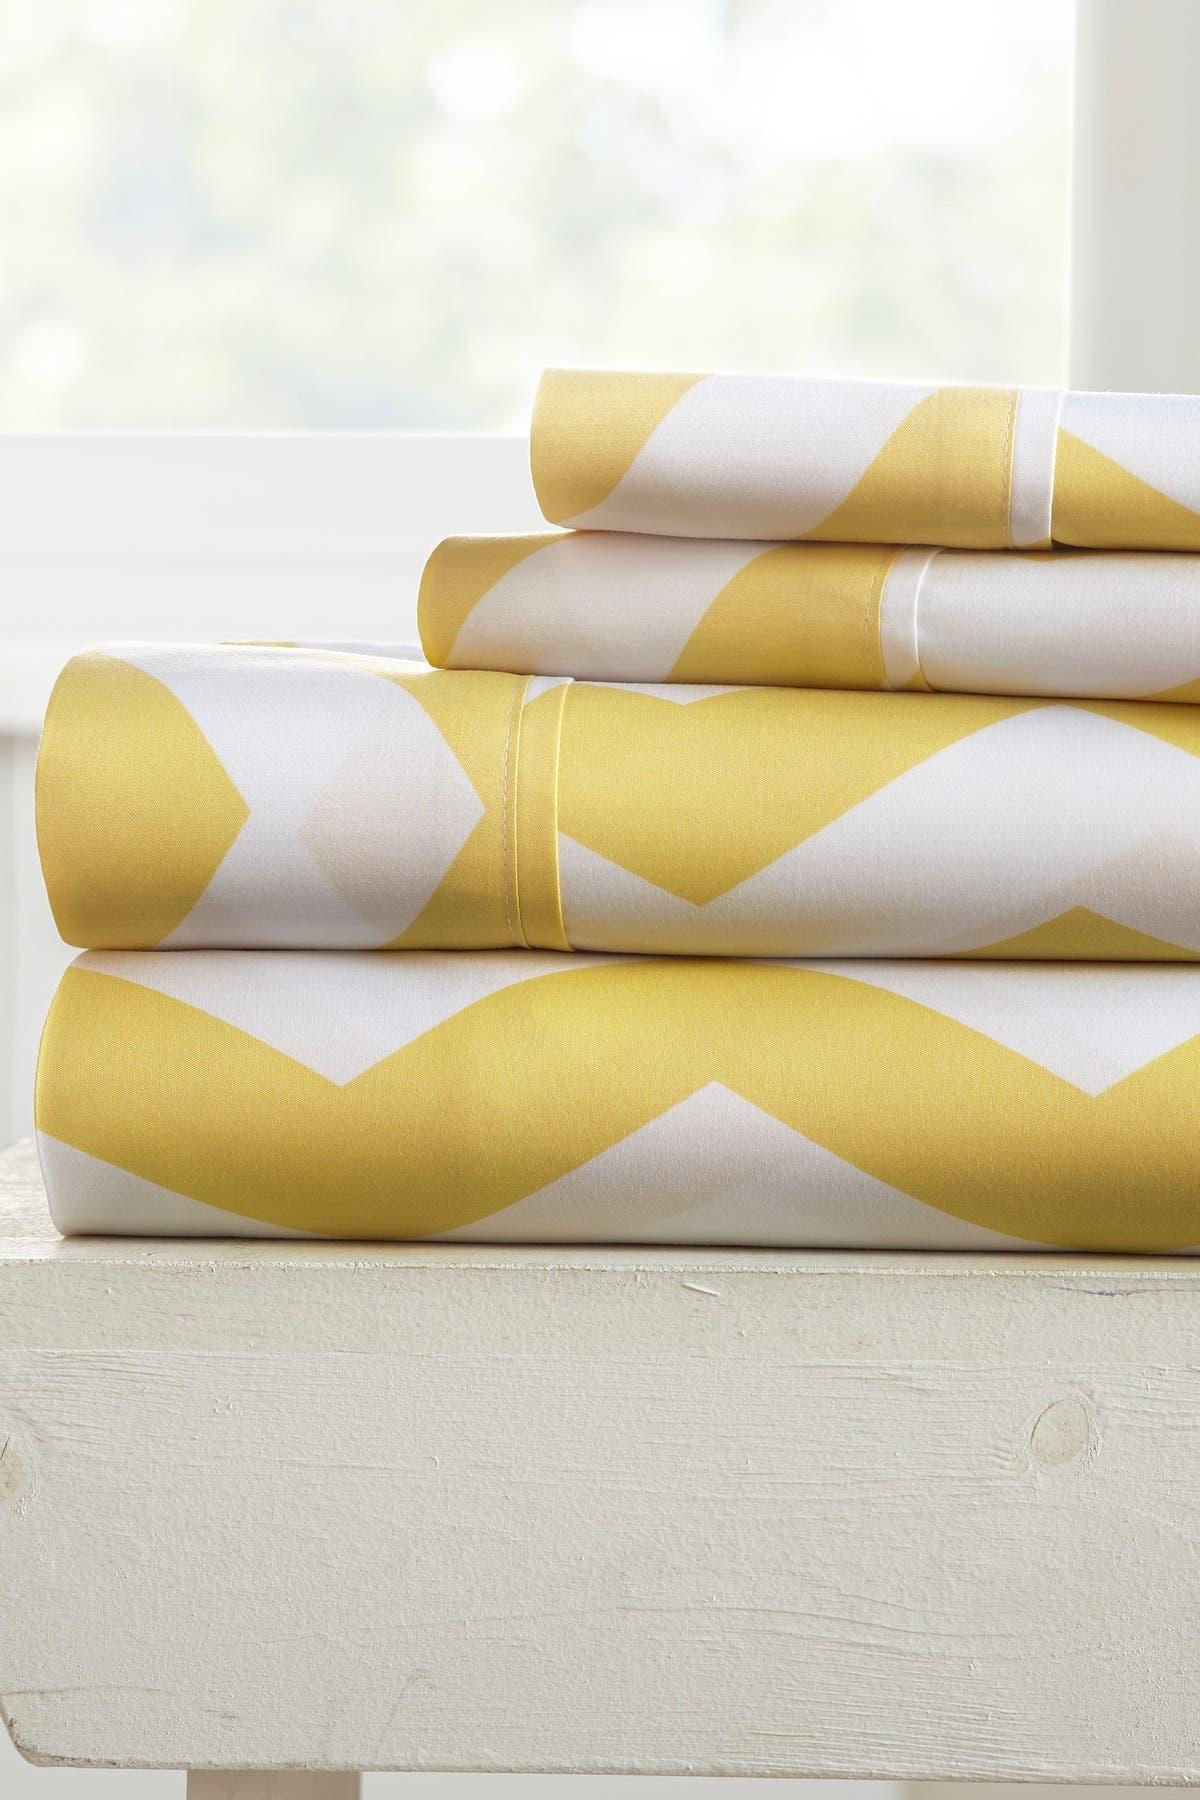 Image of IENJOY HOME Home Spun Premium Ultra Soft Arrow Pattern 3-Piece Twin Bed Sheet Set - Yellow